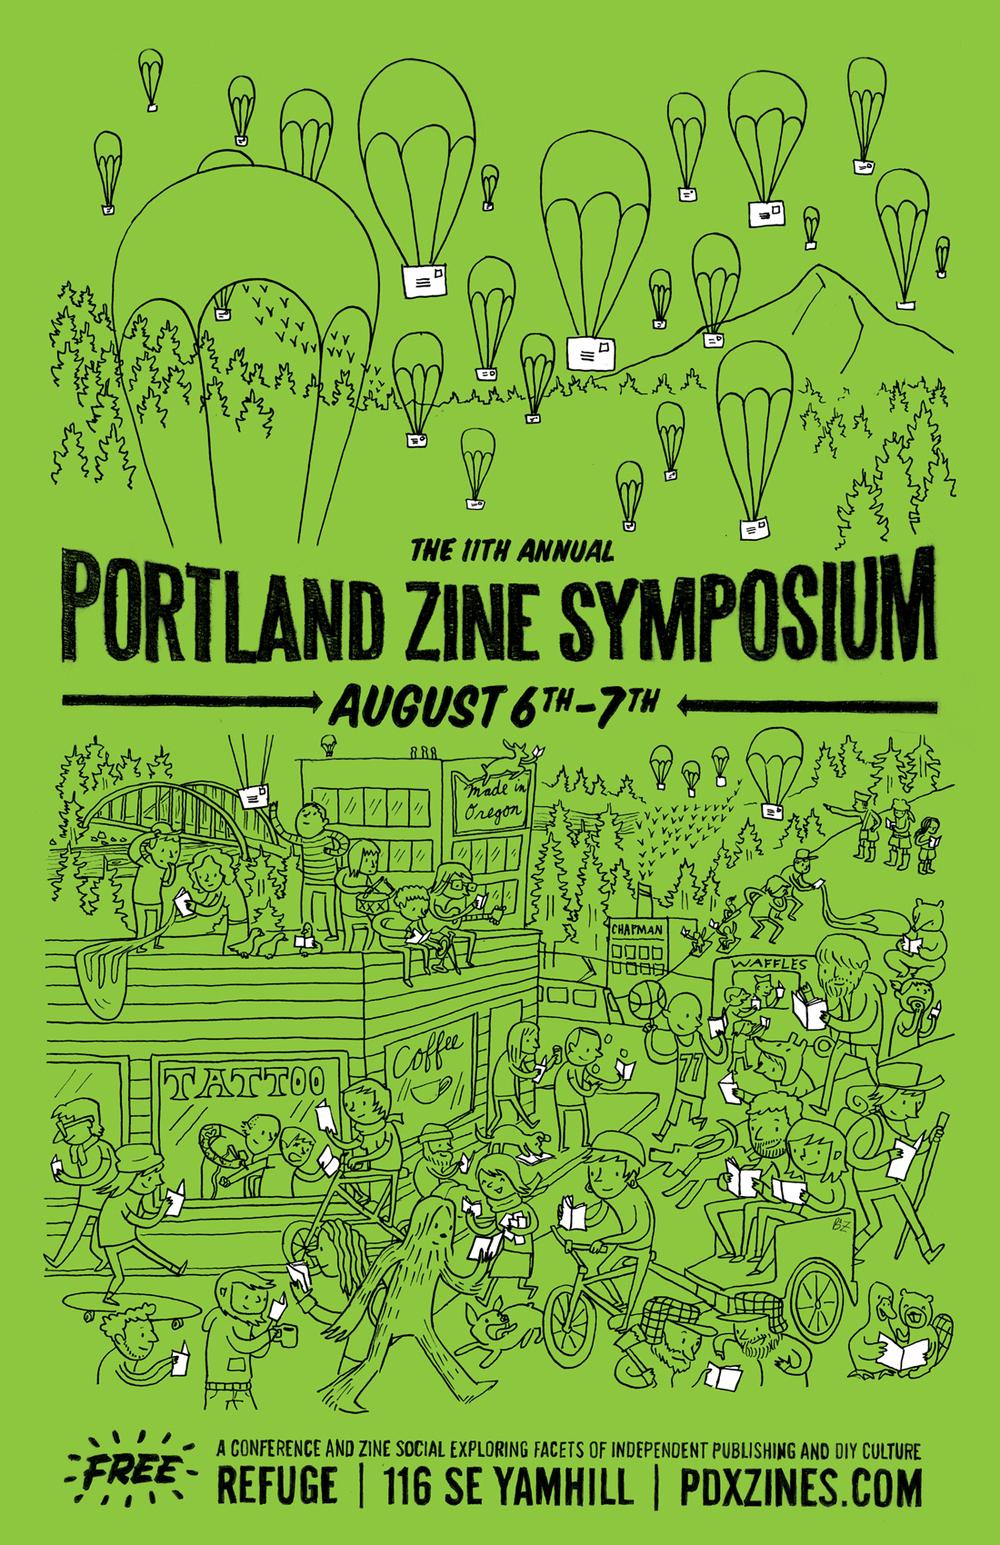 Portland Zine Symposium Poster